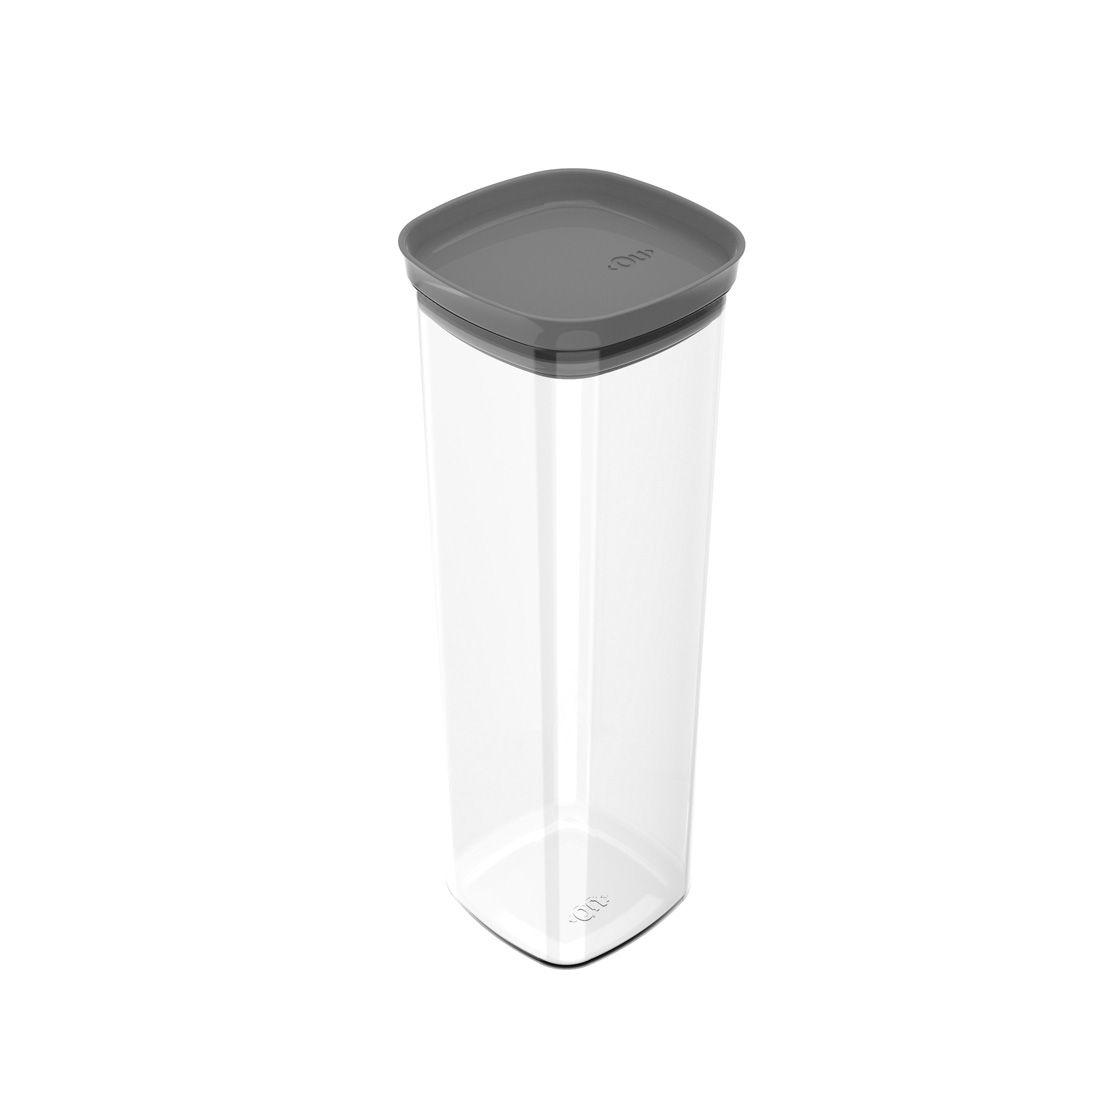 Pote de Plástico com Tampa Hermética Block 2L Chumbo